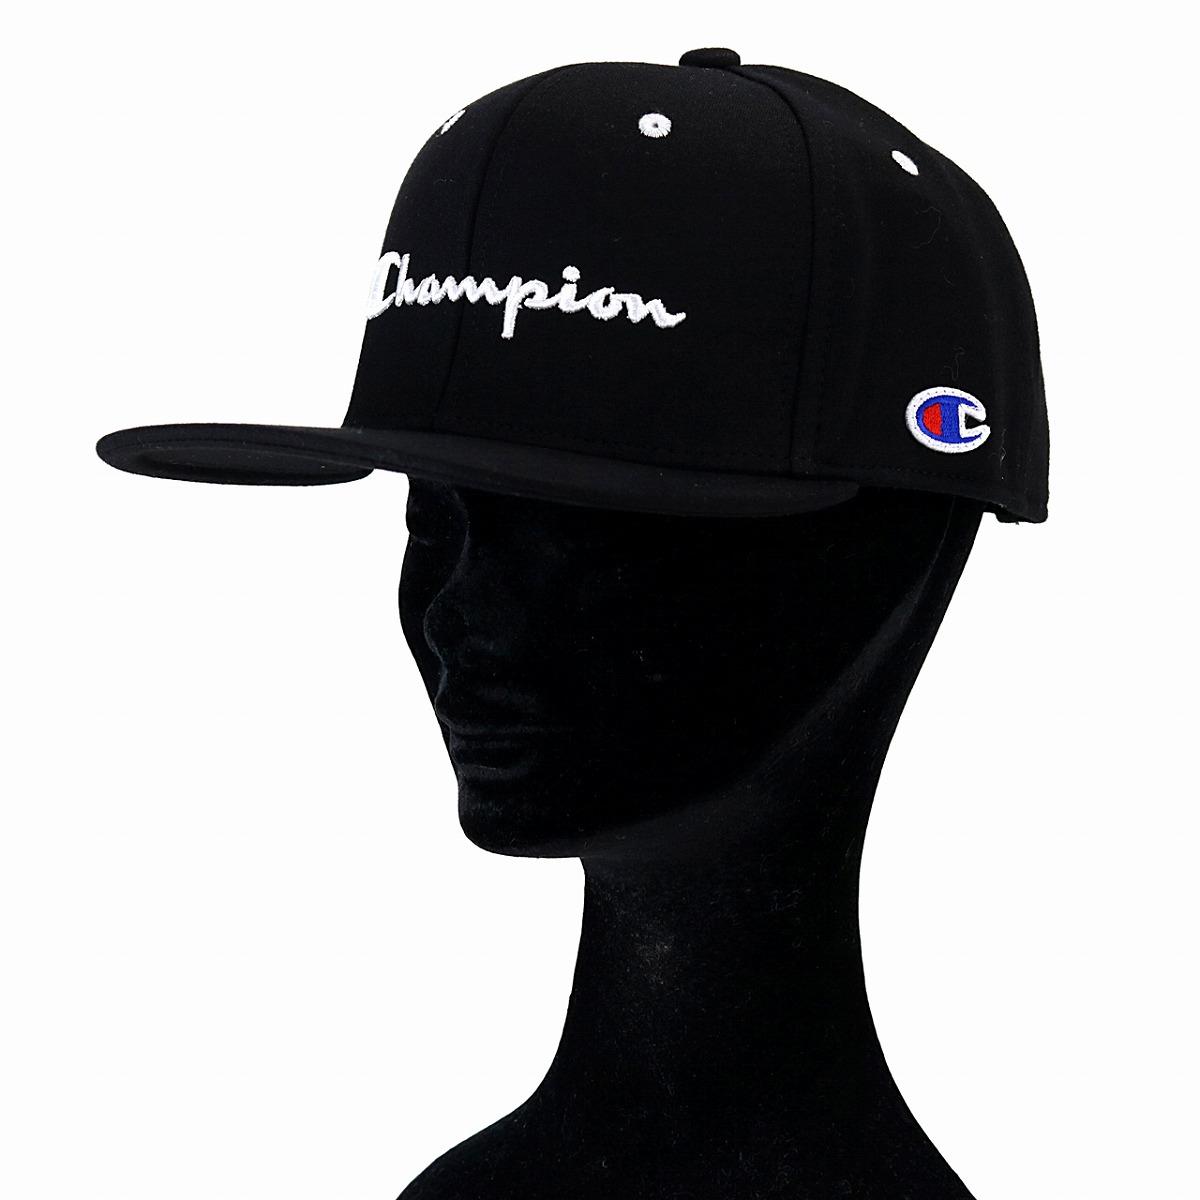 10f6ffd278c Champion sweat shirt cap men 6 cap casual hat lady s sports baseball cap  champion cap logo cap adjustable size black black  baseball cap  birthday  present ...